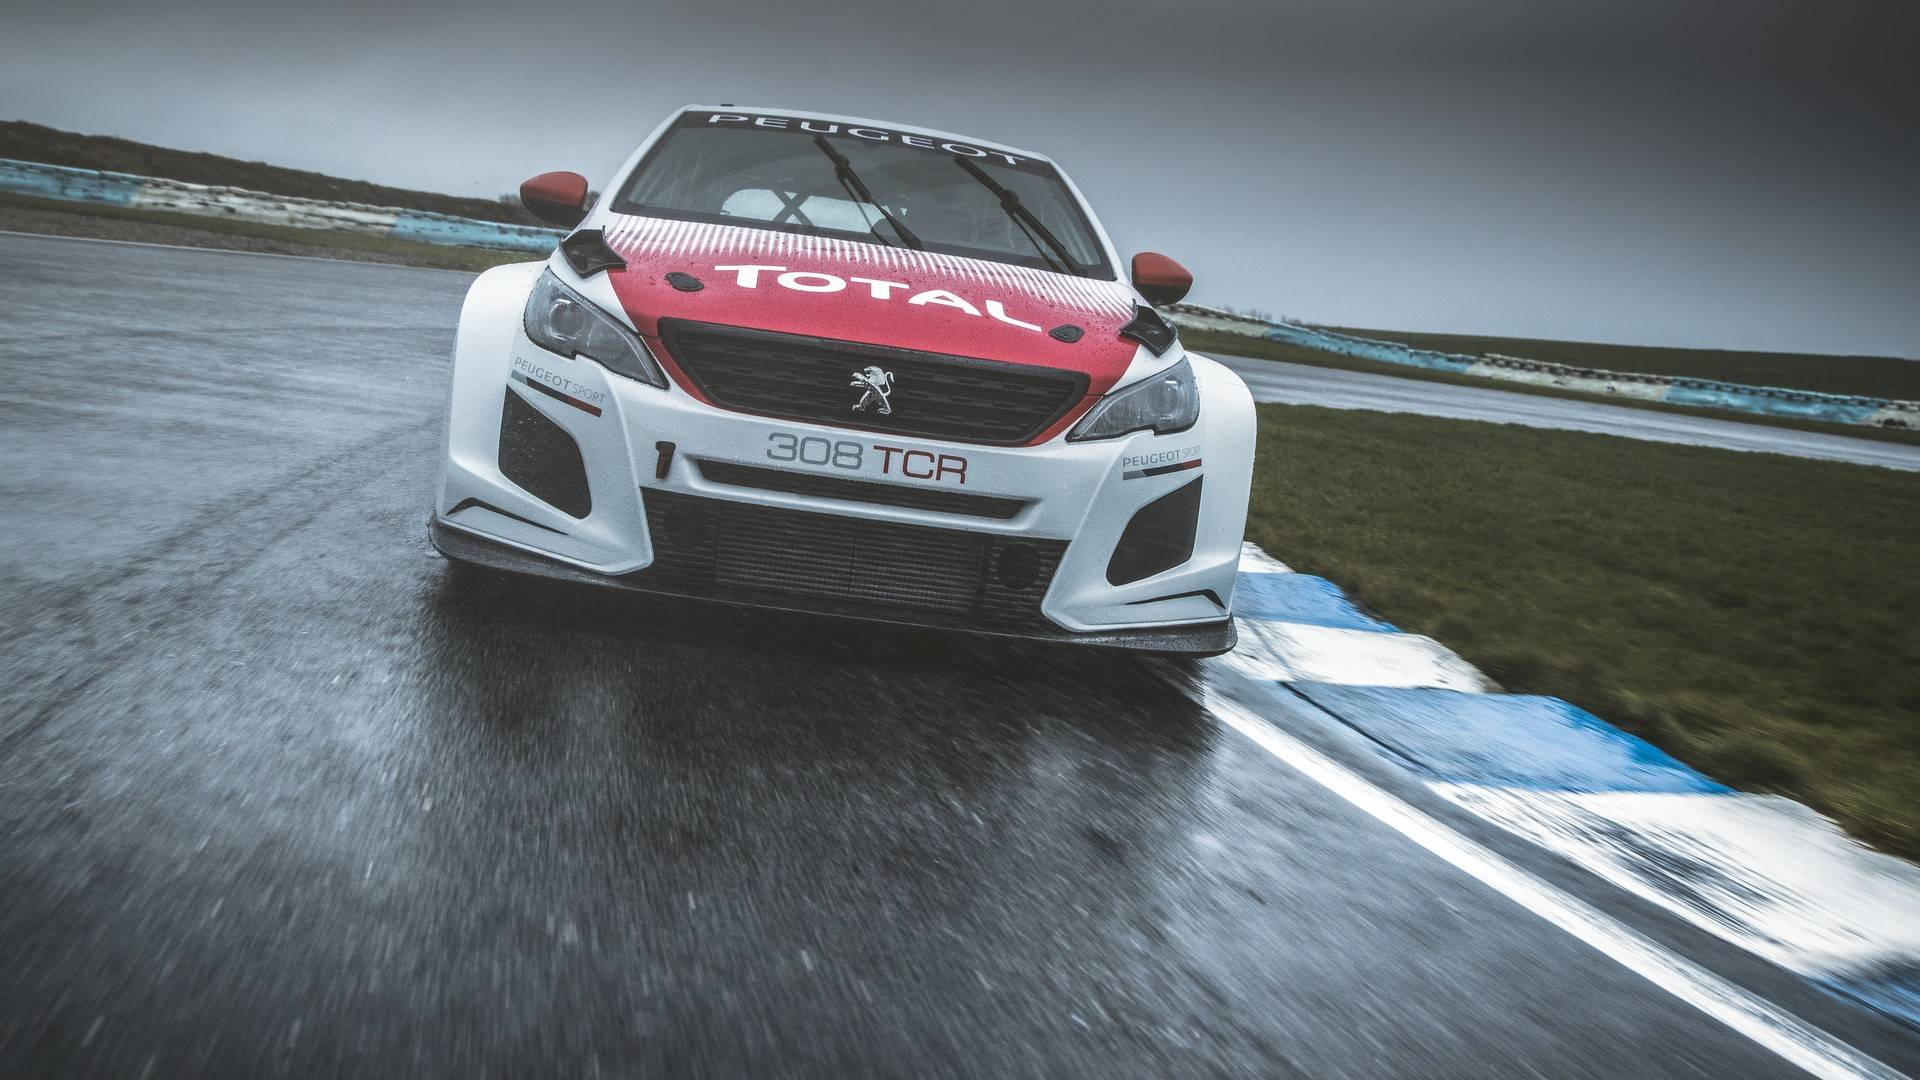 Peugeot 308 TCR 2018 (7)